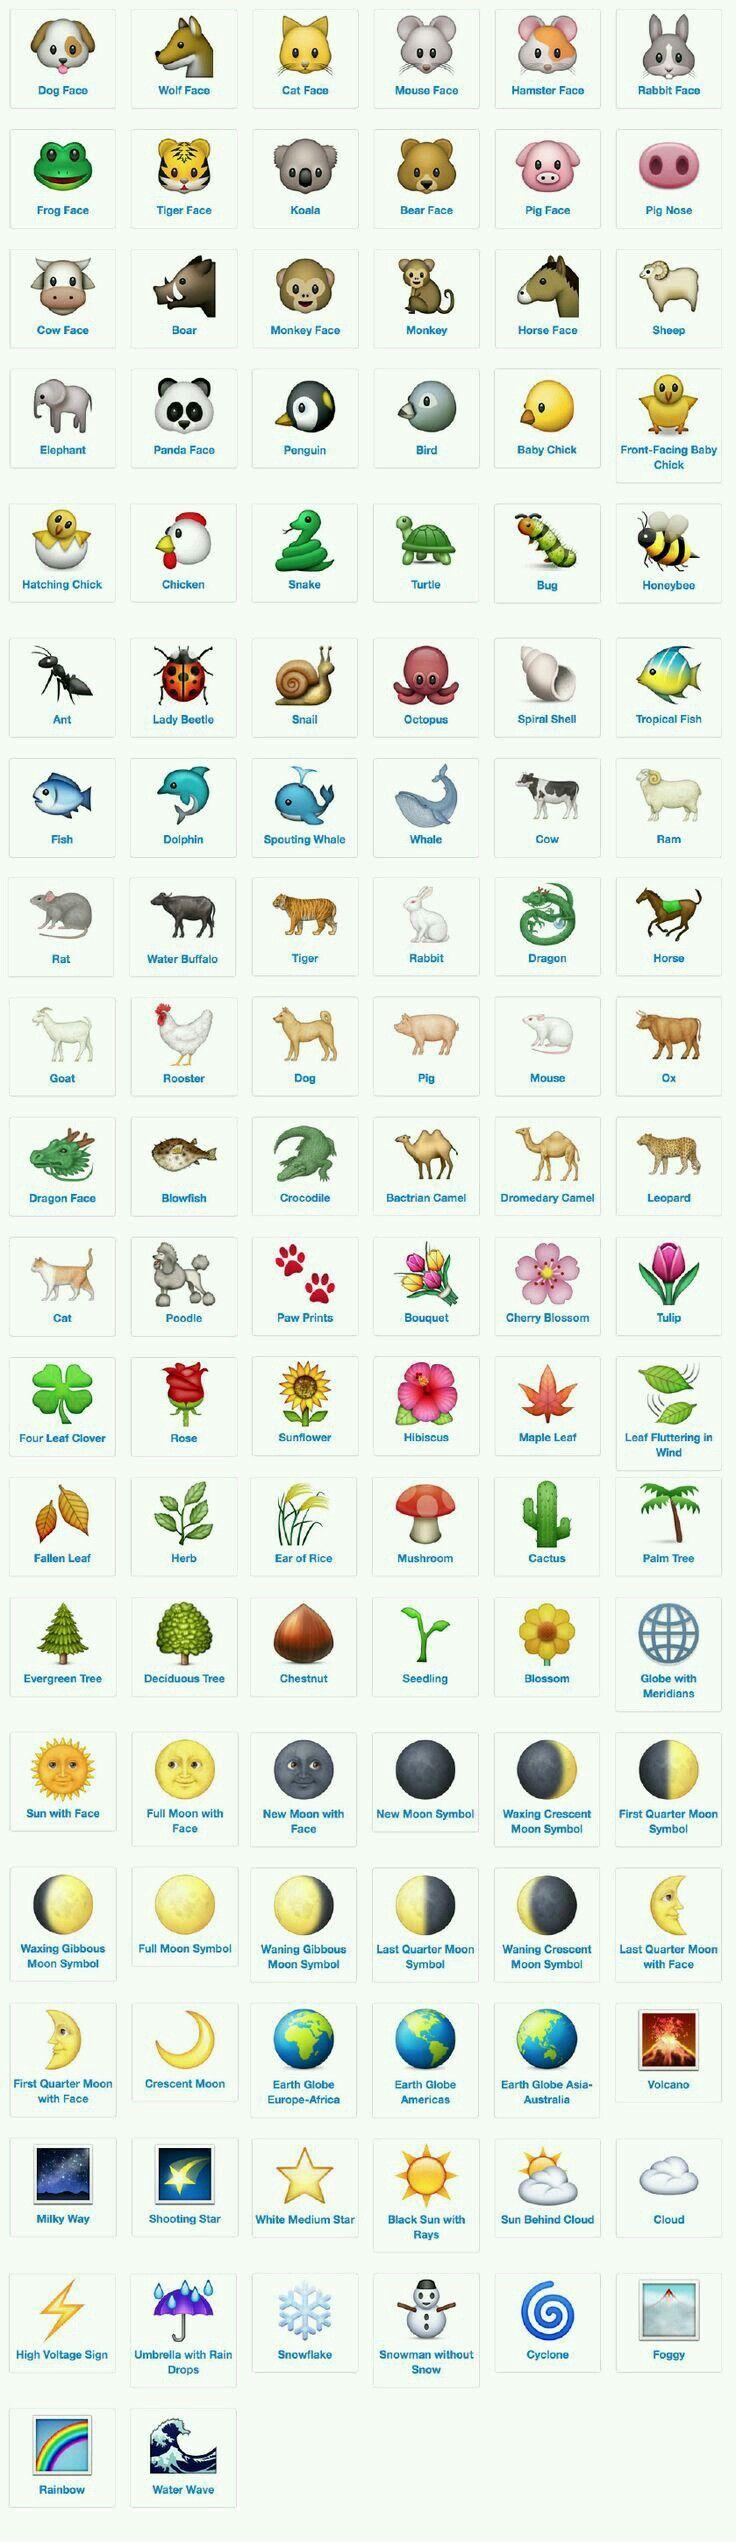 Pin by Bliss on Emoji Emoji art, Emoji chart, Emojis